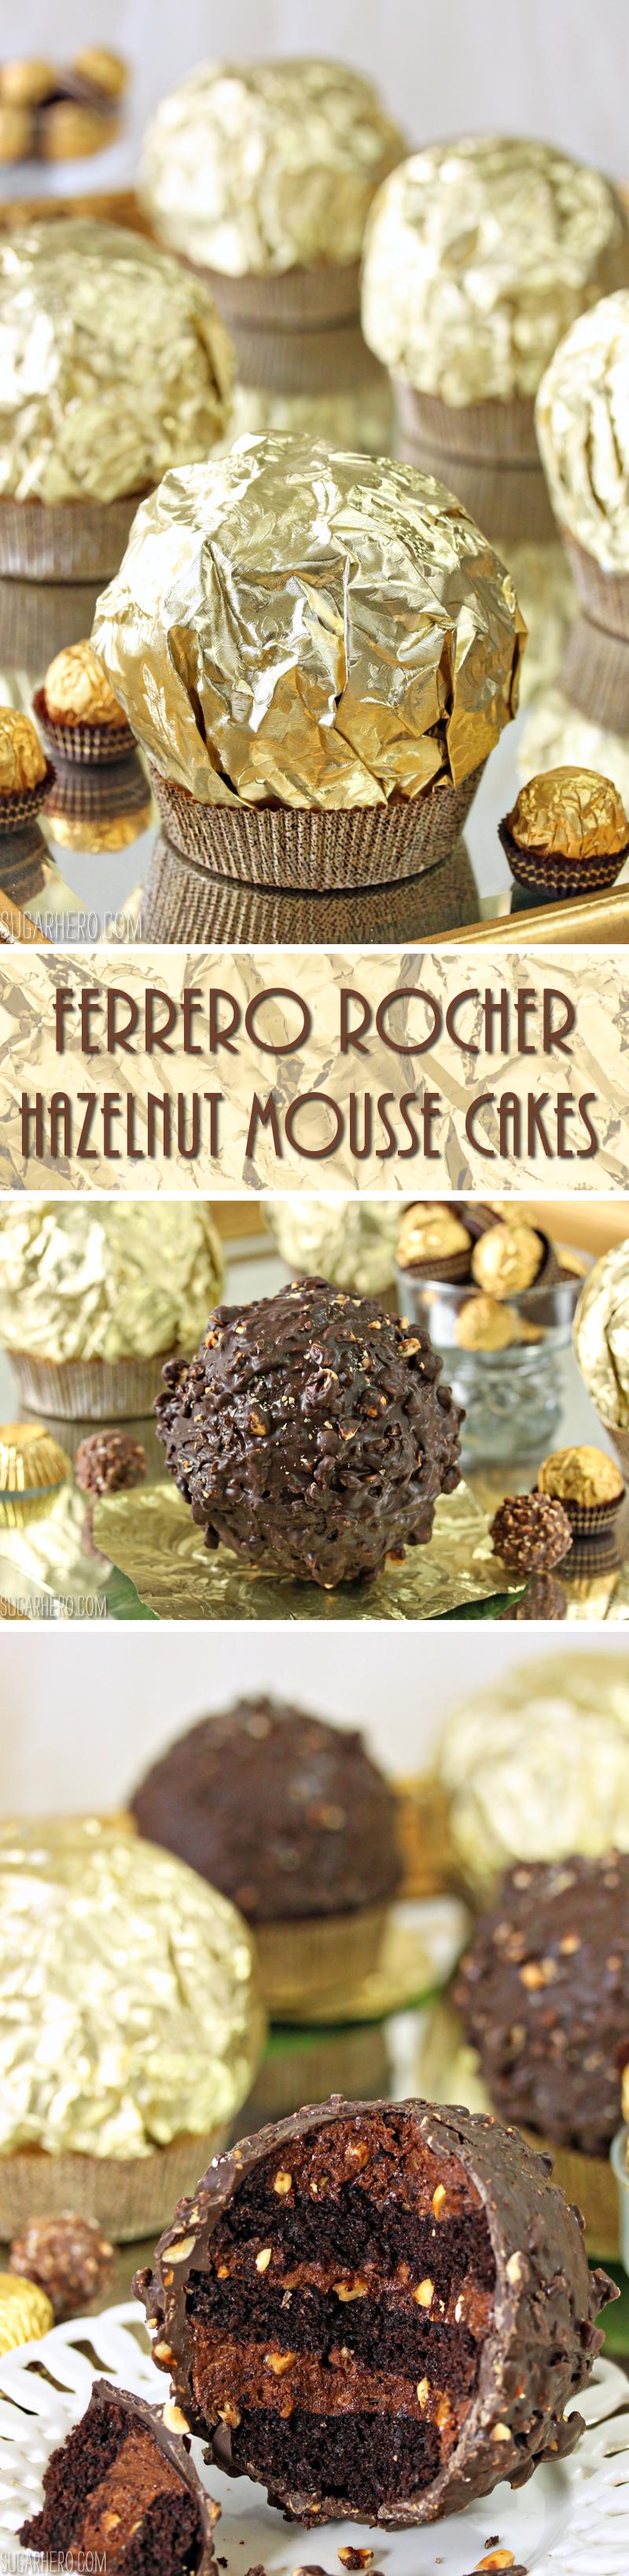 Giant Ferrero Rocher Hazelnut Mousse Cake | From SugarHero.com